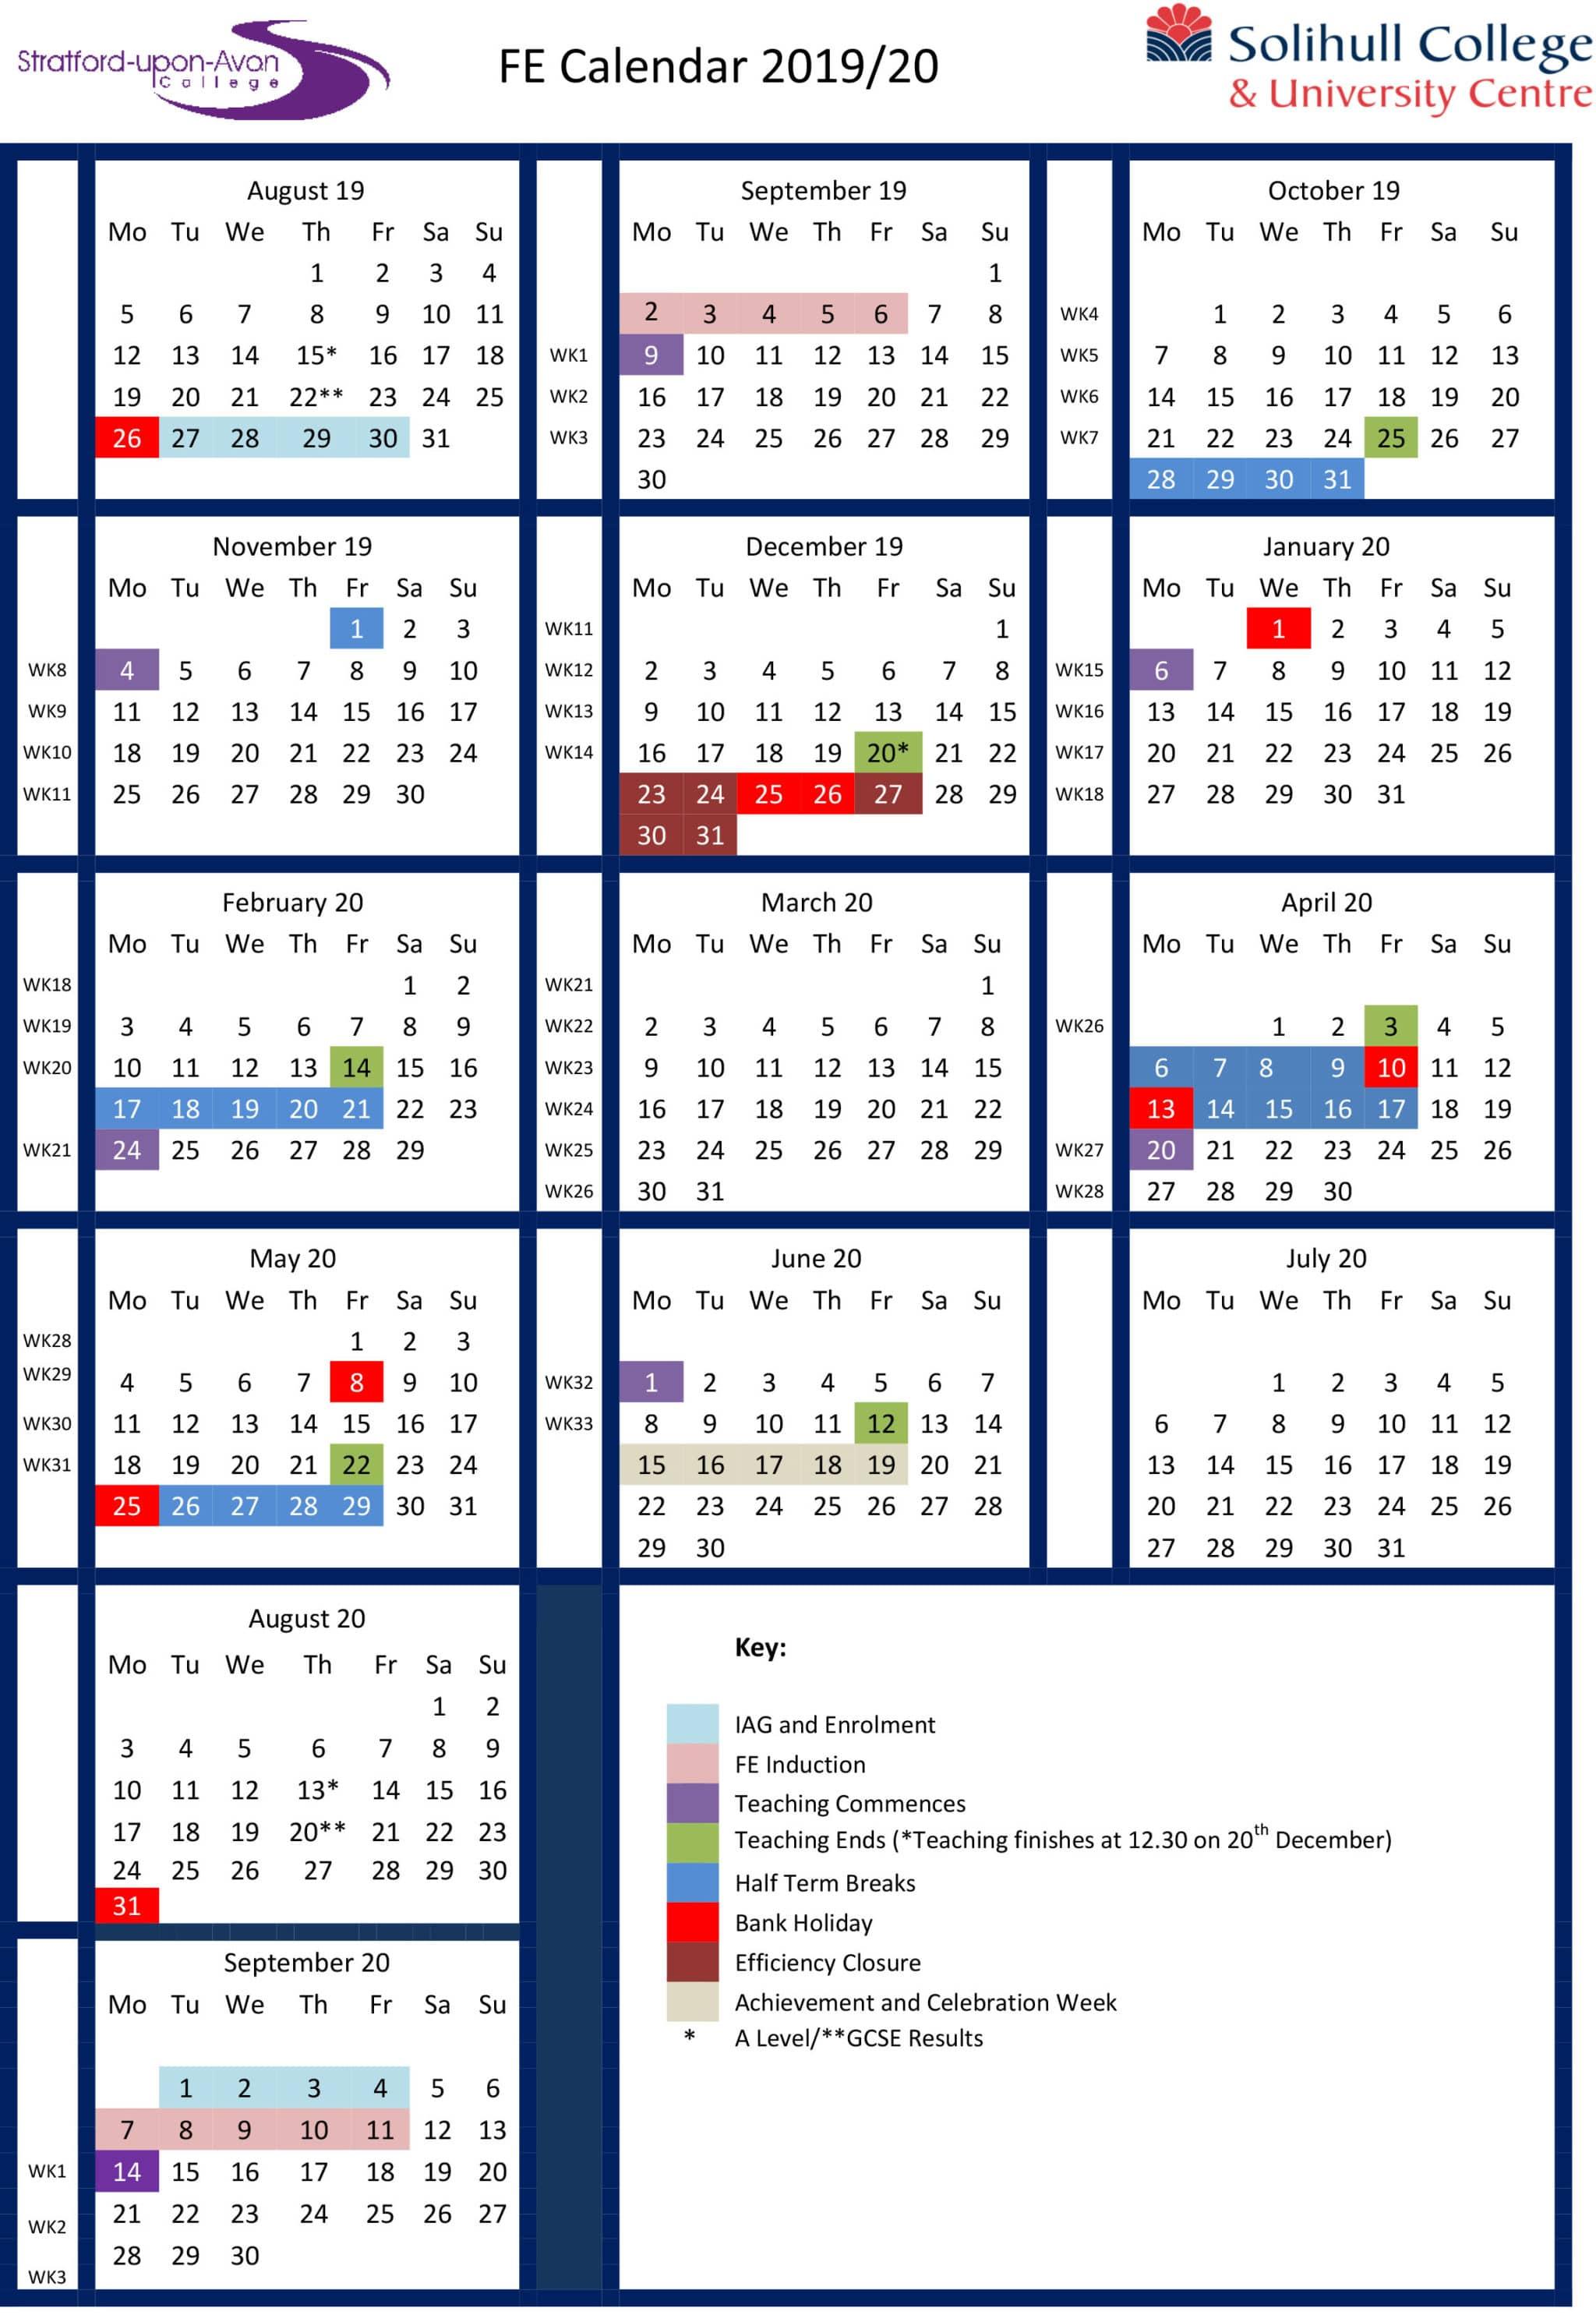 Term Dates | Solihull College & University Centre